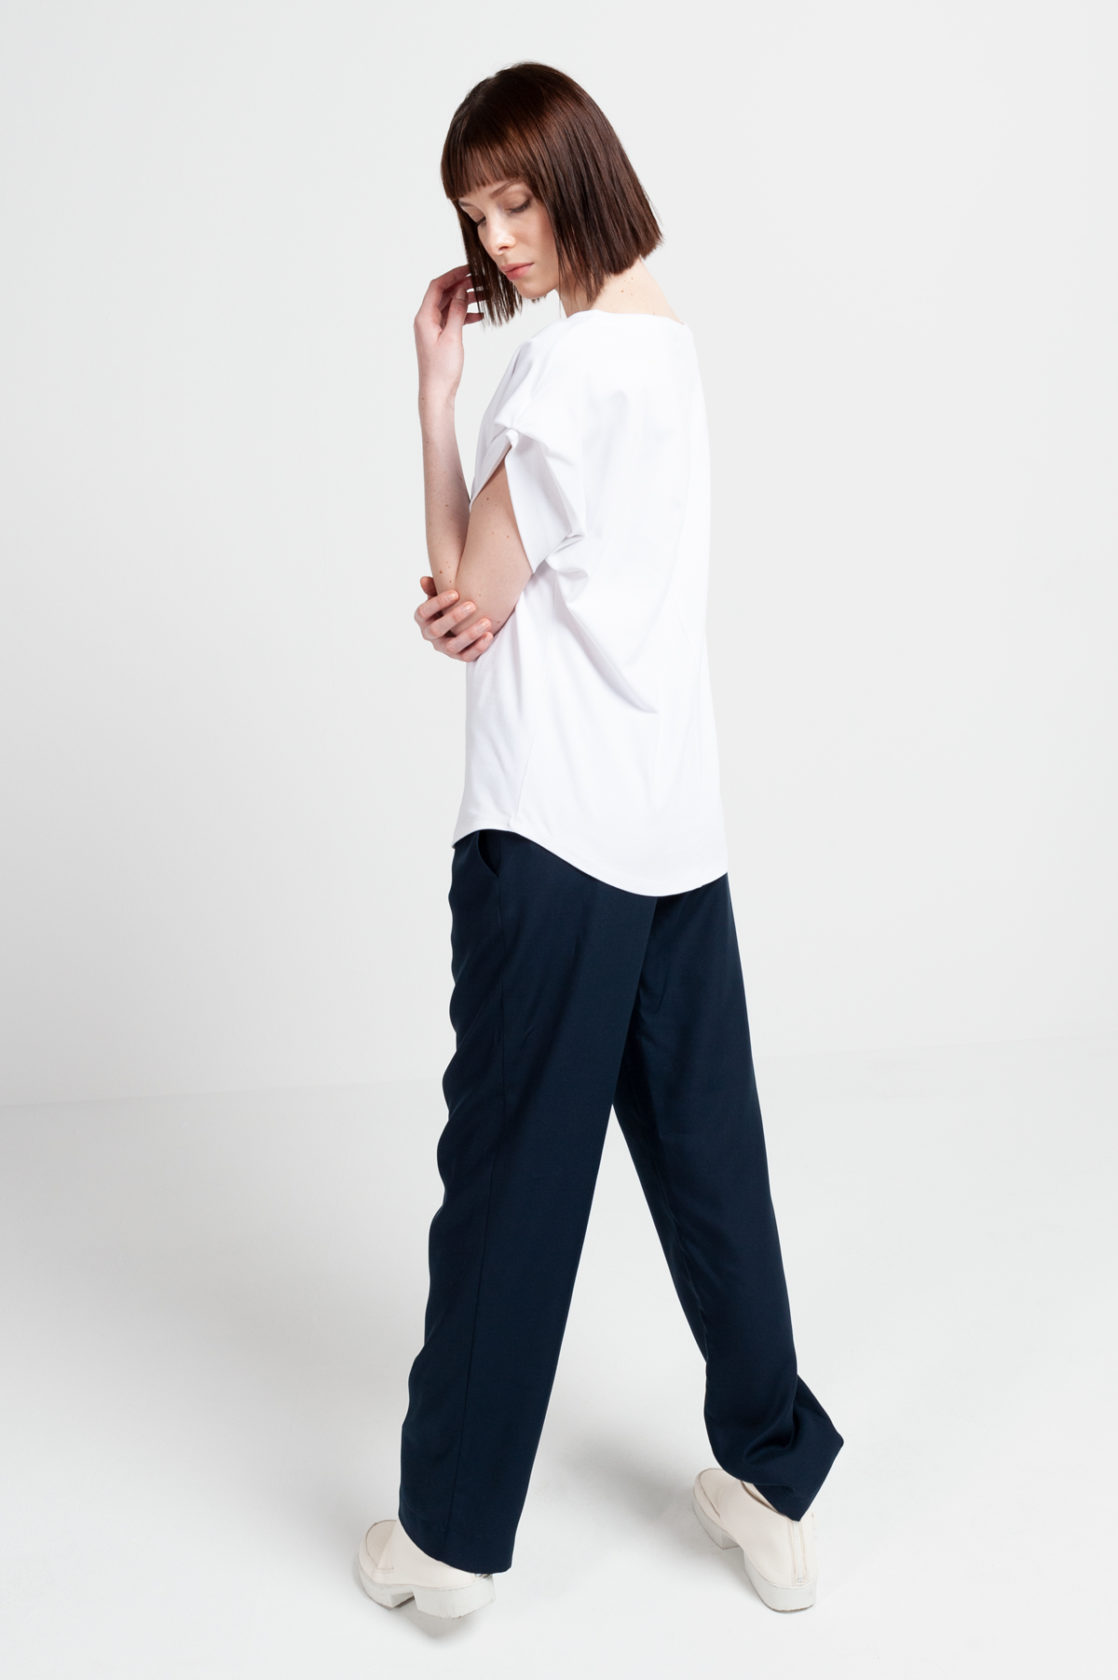 Roberta Organic Fashion Shipsheip Ellie T Shirt White (2)